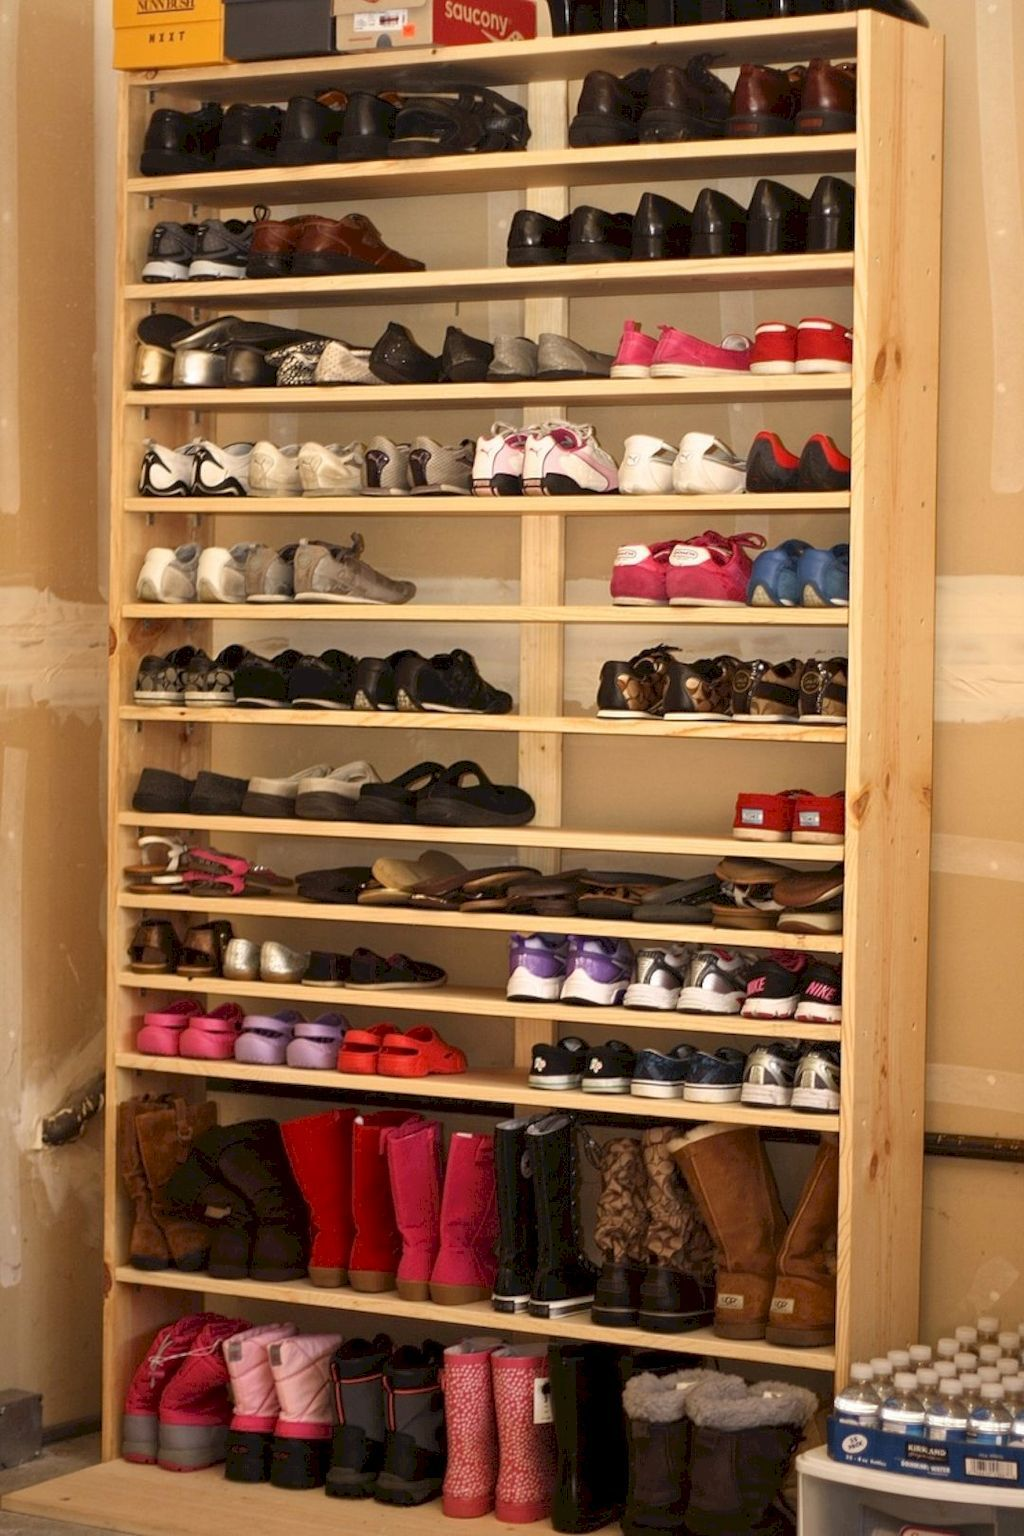 Inspirational Shoe Racks and Cabinets